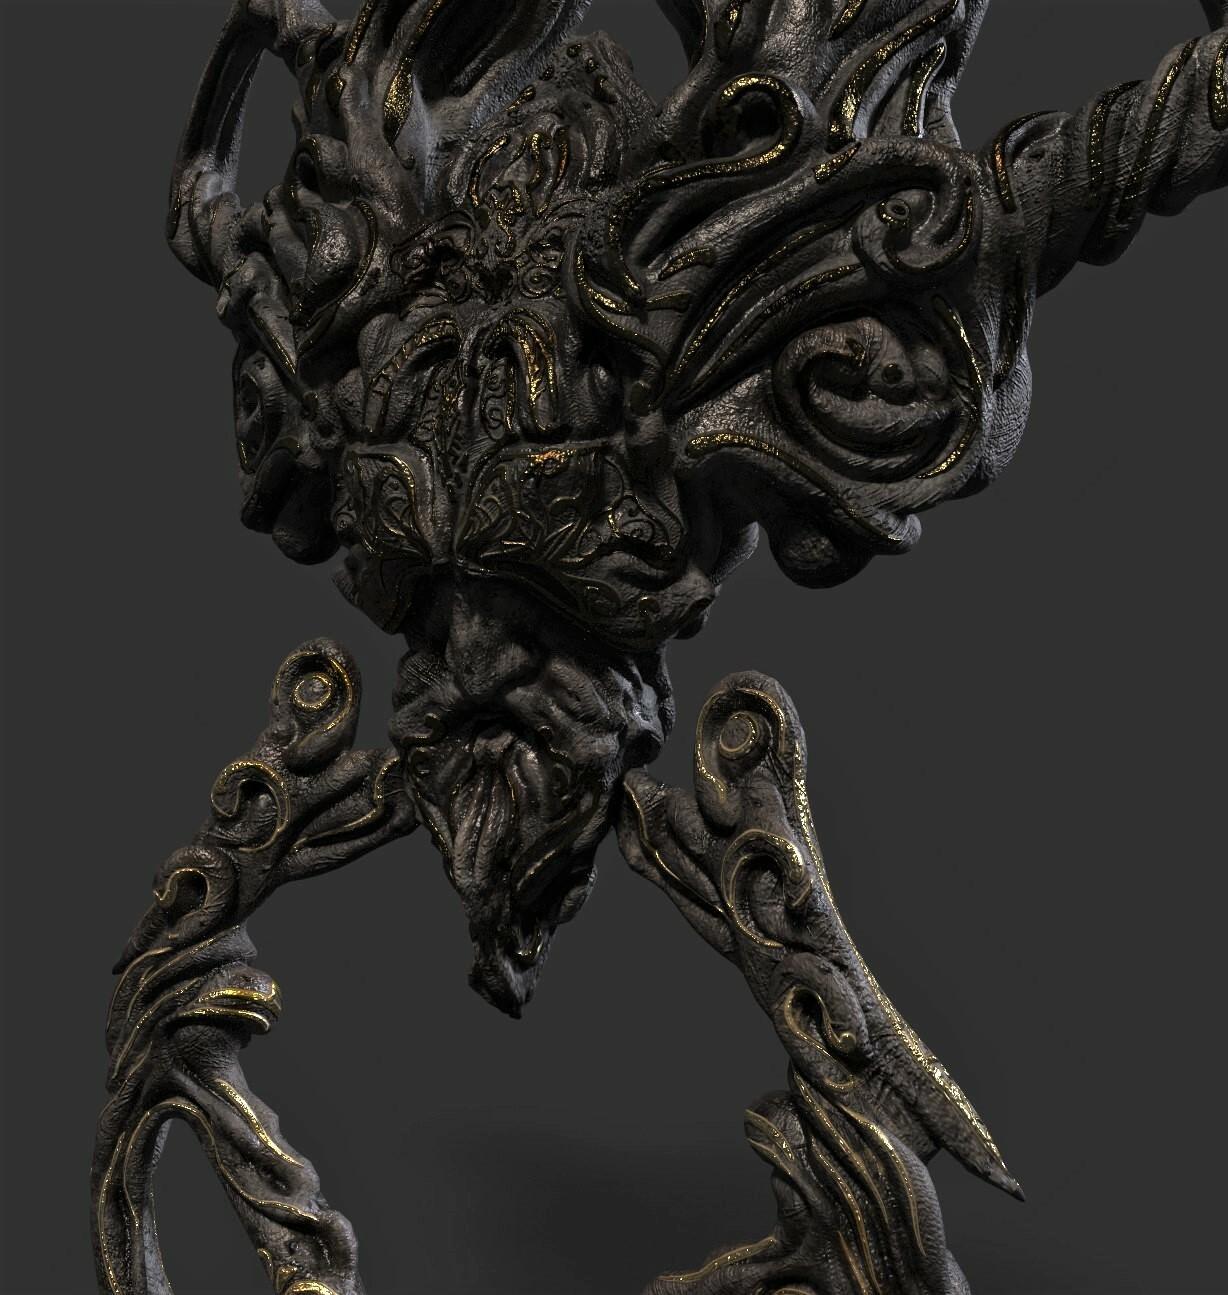 3D Game asset/ Concept design #2